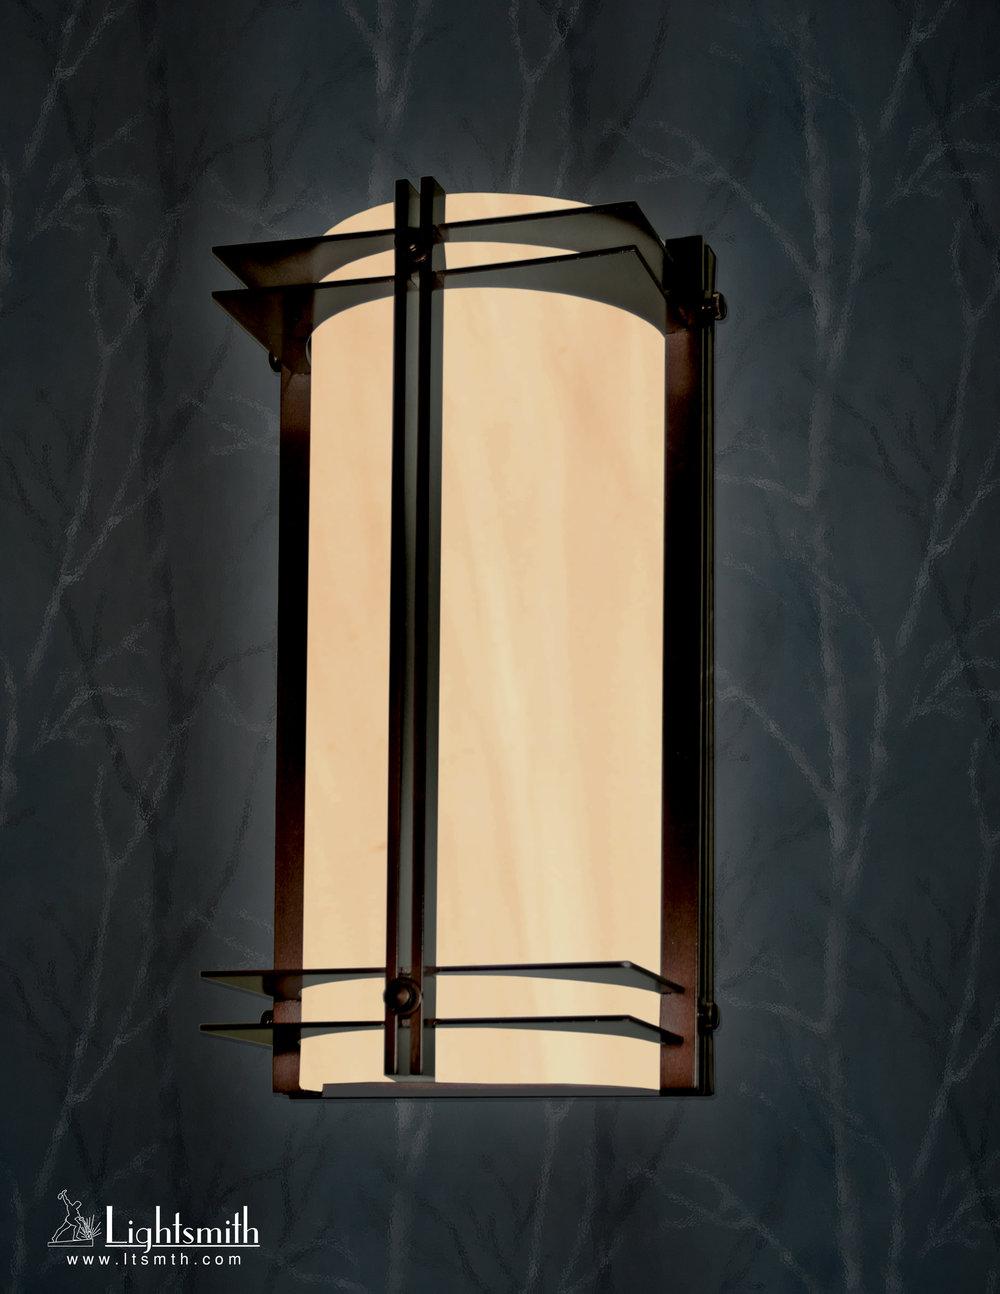 SC-8501 -Oil Rubbed Bronze -Beige Alabaster Acrylic